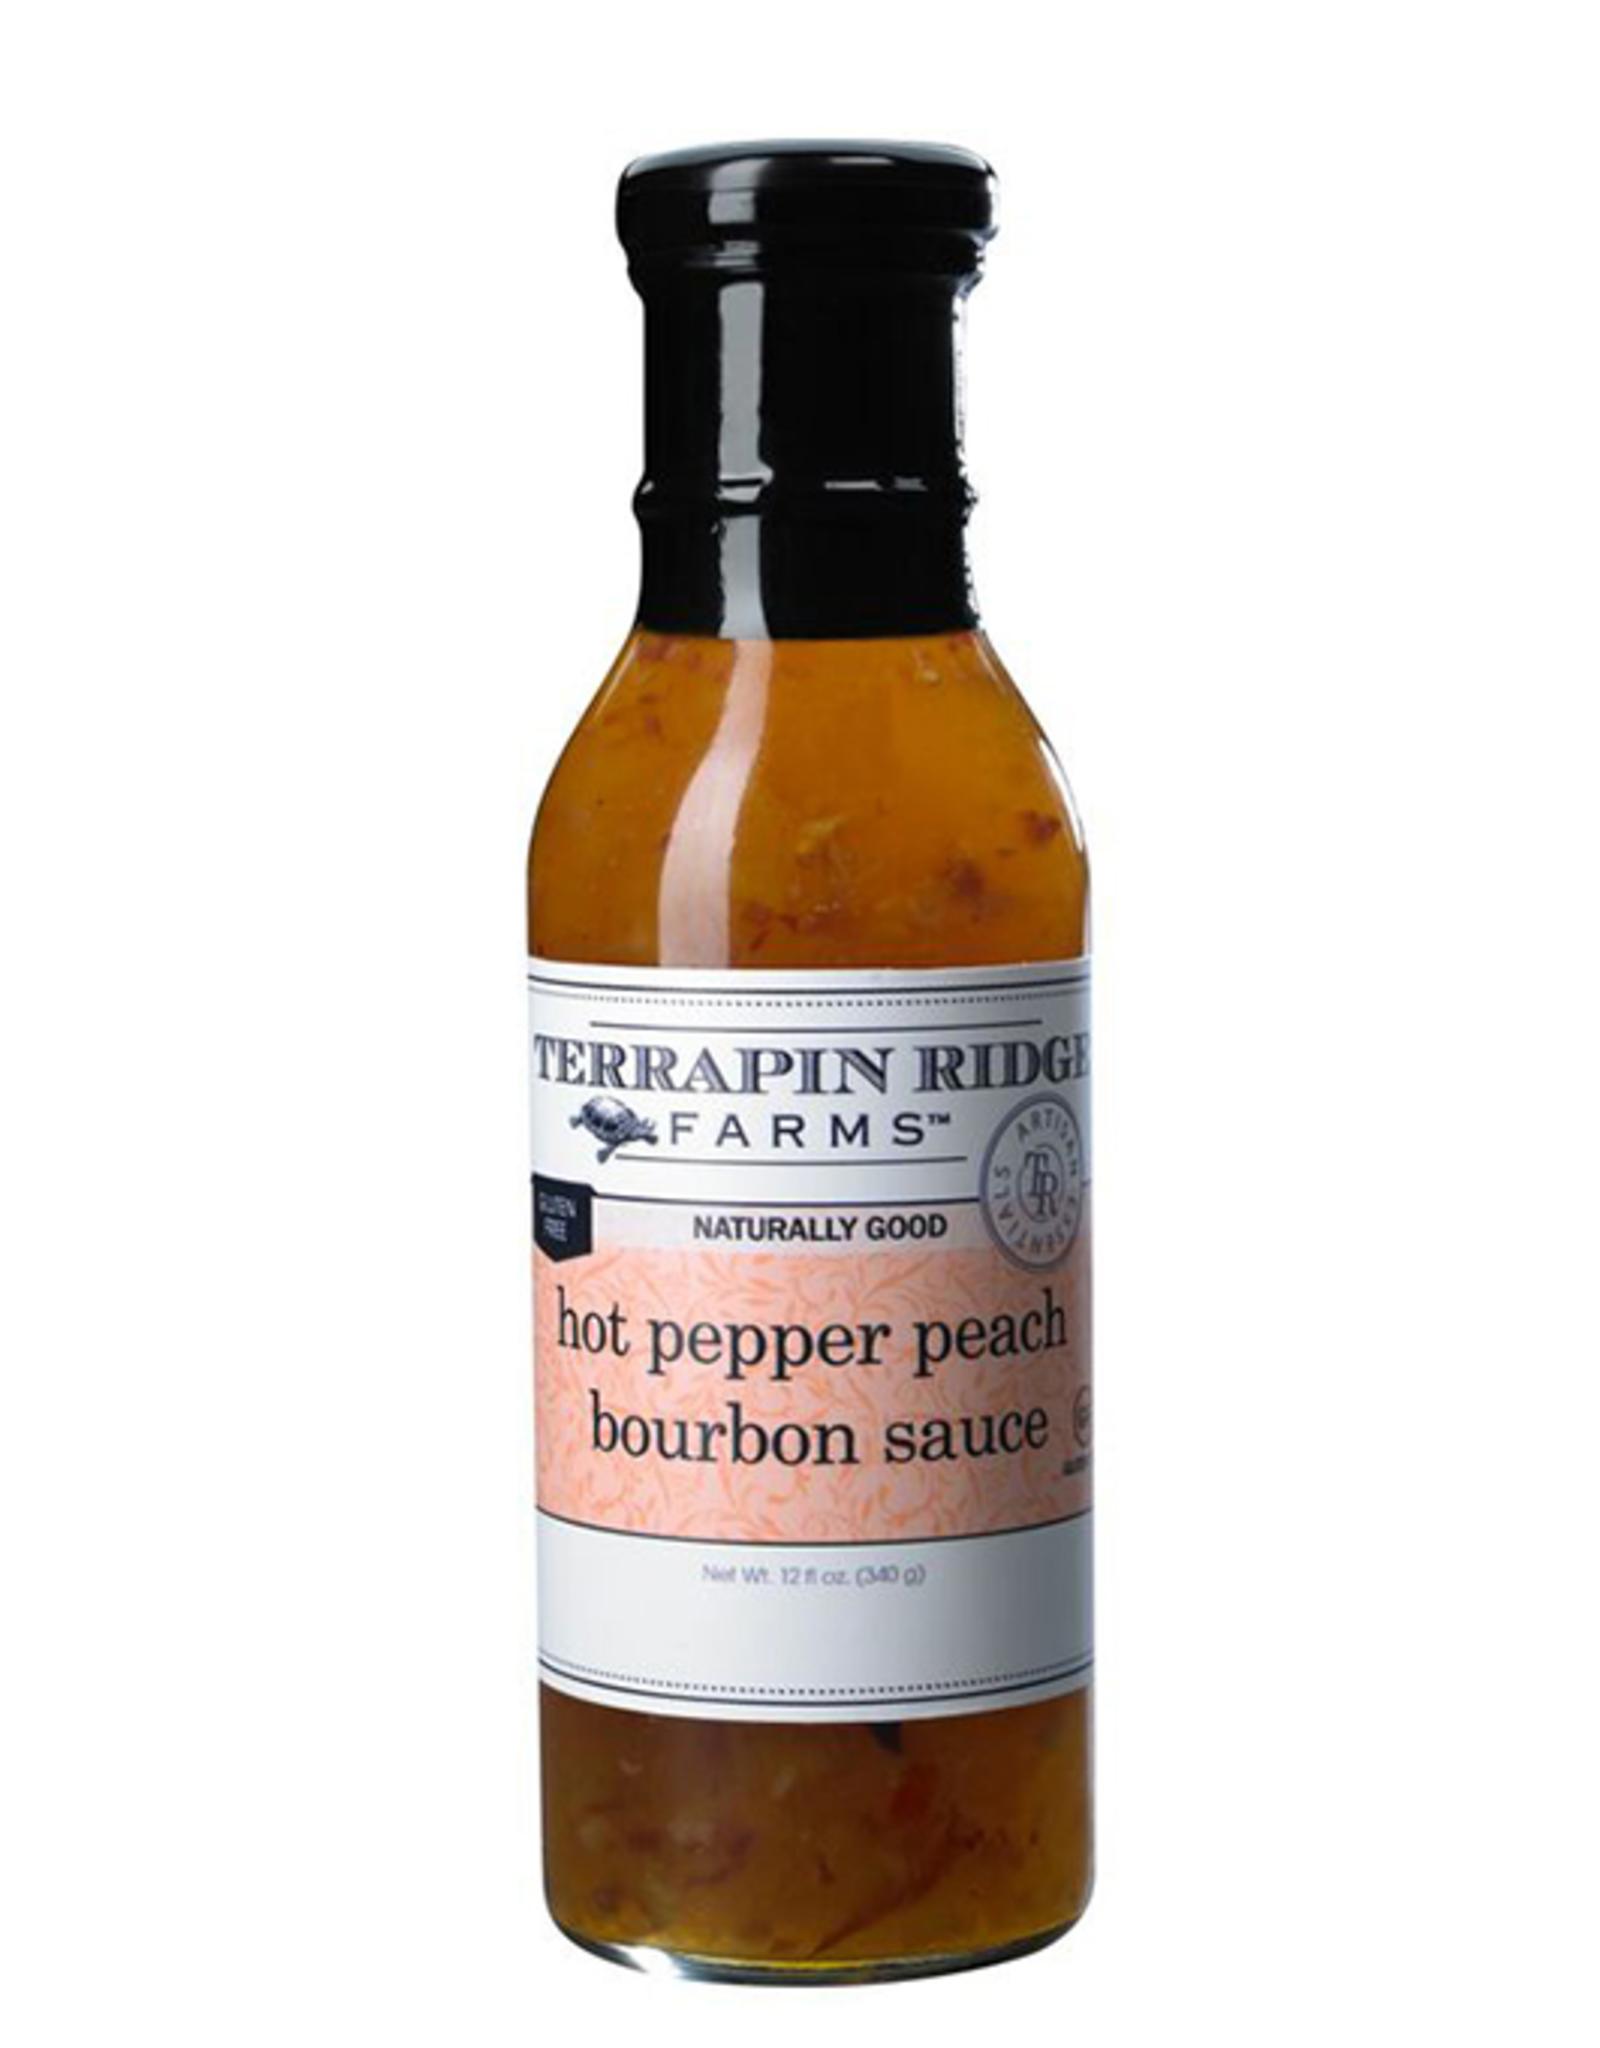 Terrapin Ridge Hot Pepper Peach Bourbon Sauce